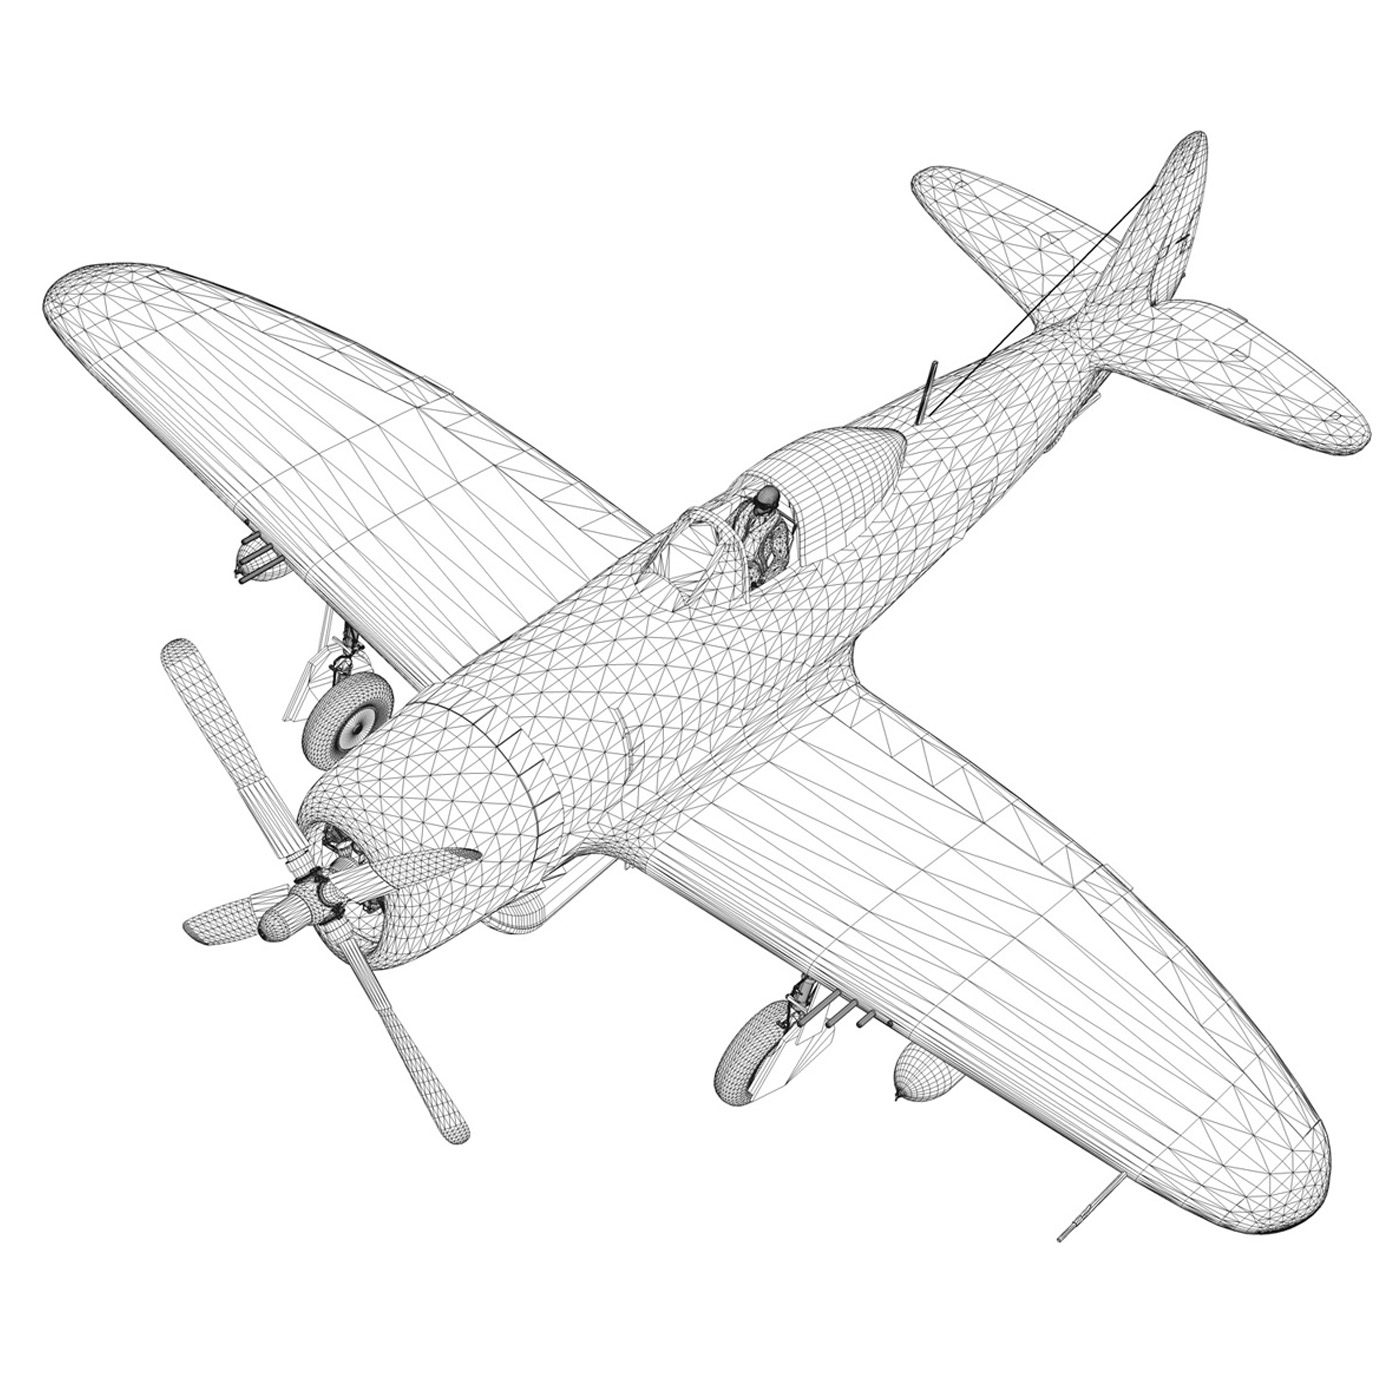 republic p-47 thunderbolt – oh johnnie 3d model fbx c4d lwo obj 274266